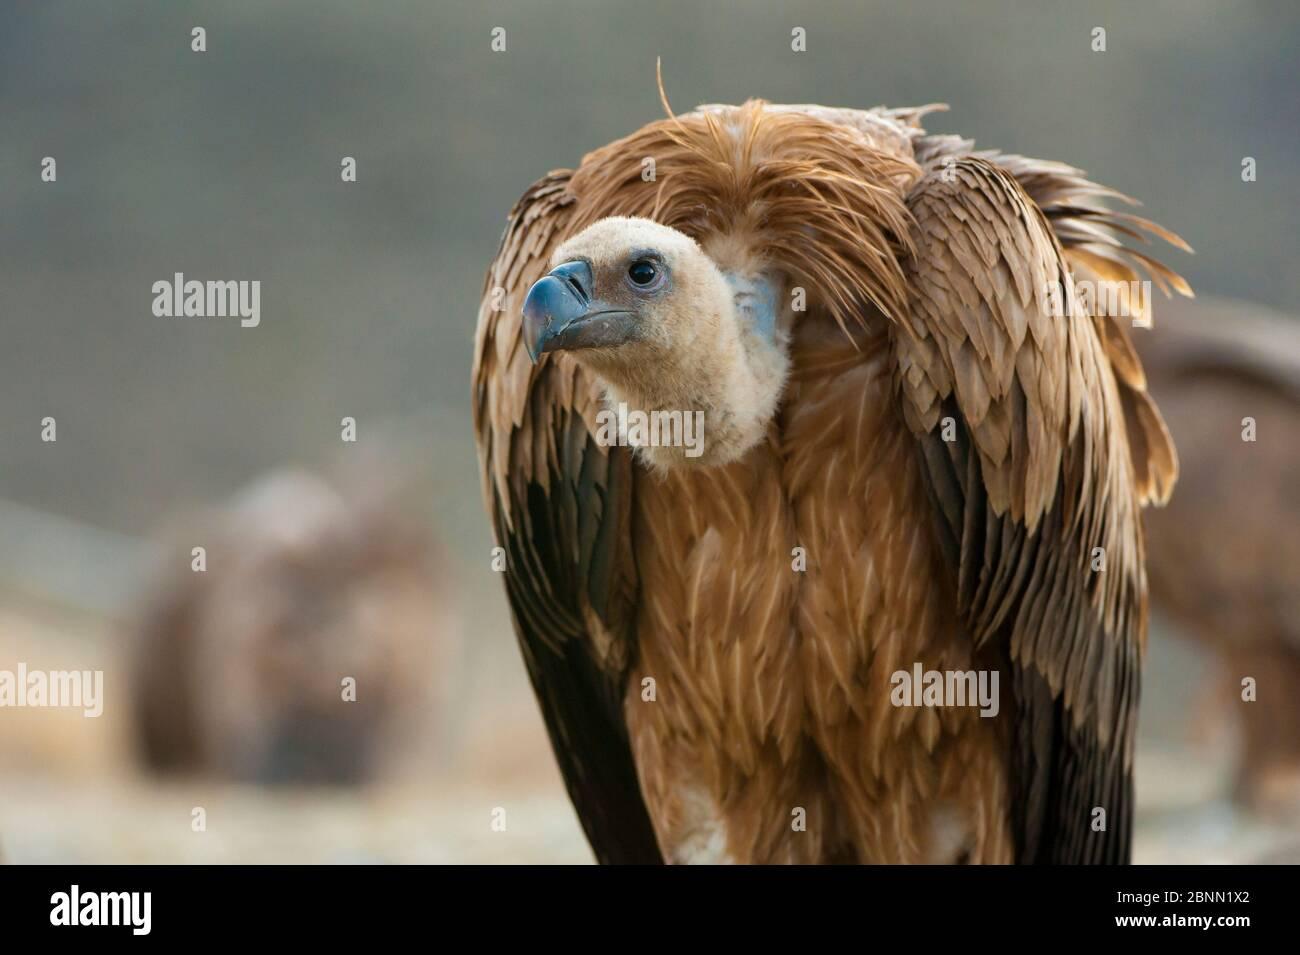 Griffon vulture (Gyps fulvus), Pyrenees, Spain. Stock Photo